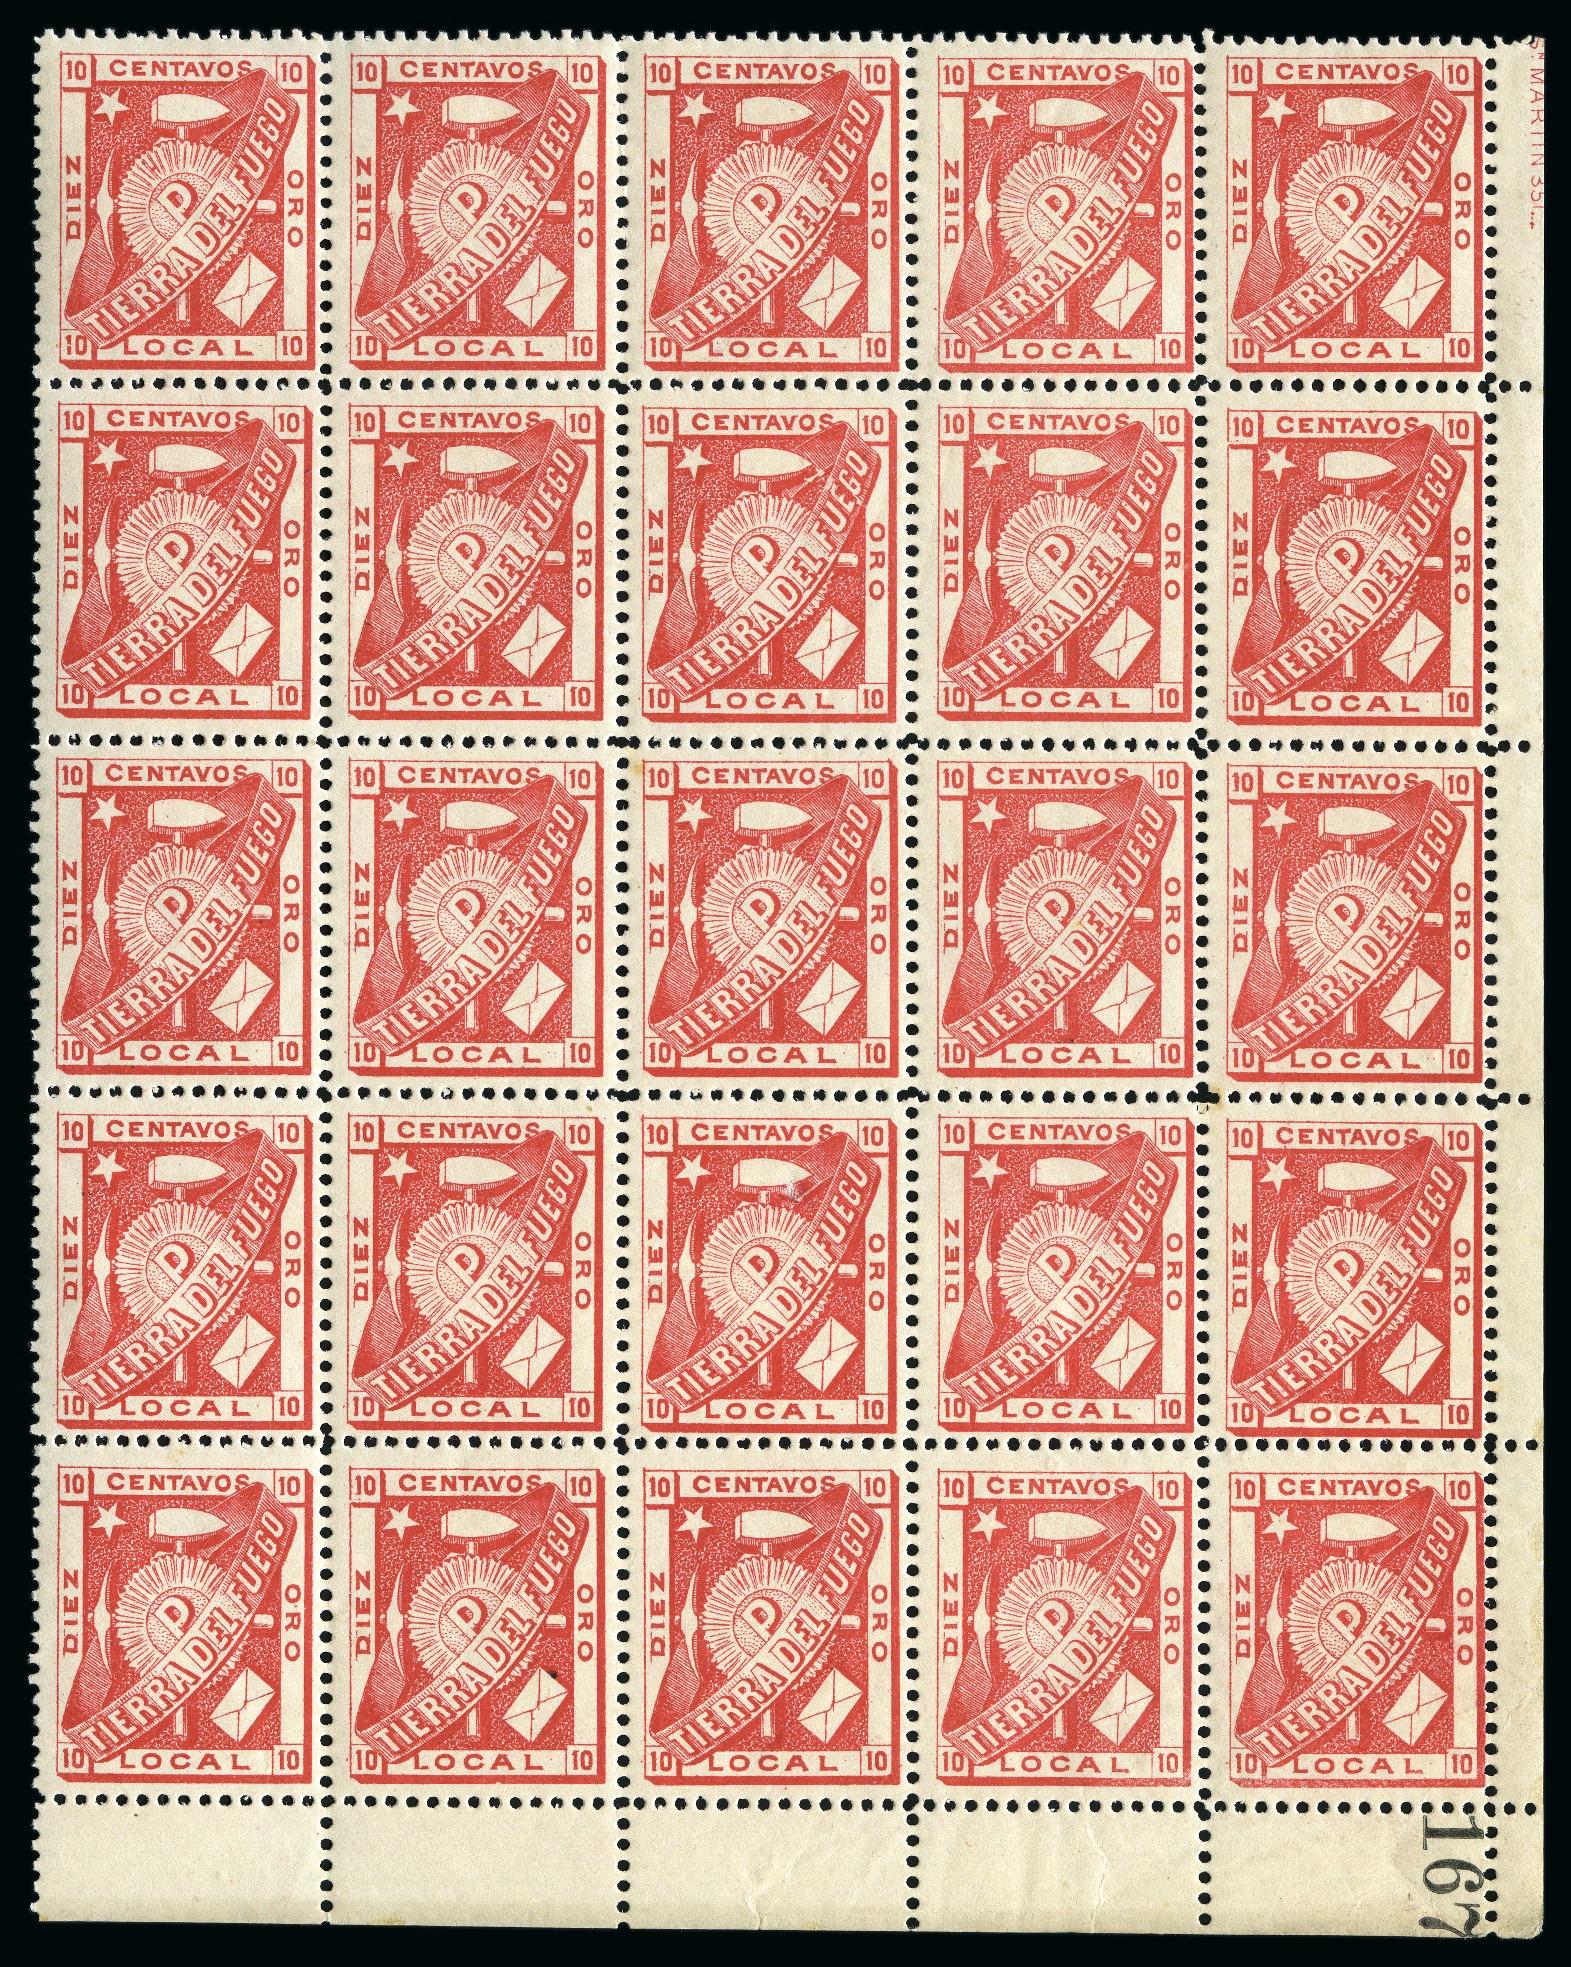 Lot 53012 - Argentina » Tierra del Fuego  -  David Feldman S.A. Overseas & Switzerland | Autumn Auction Series day 5